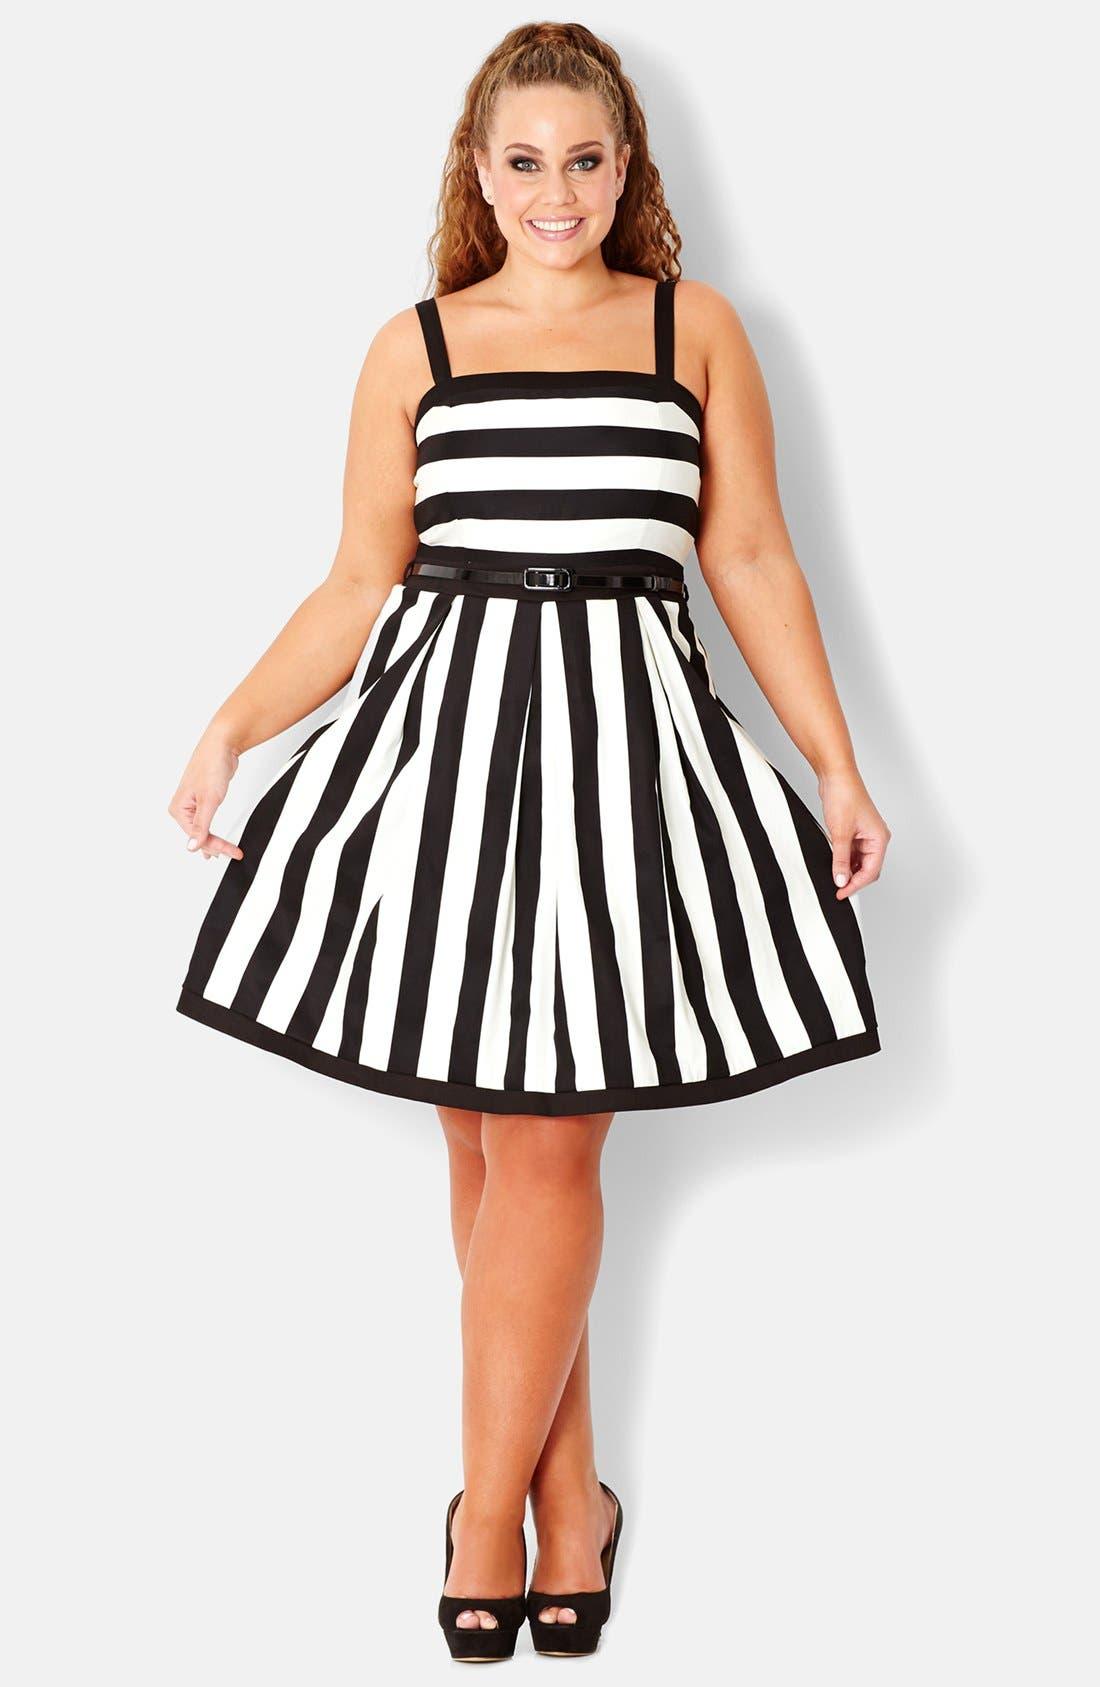 Main Image - City Chic Stripe Stretch Cotton Party Dress (Plus Size)